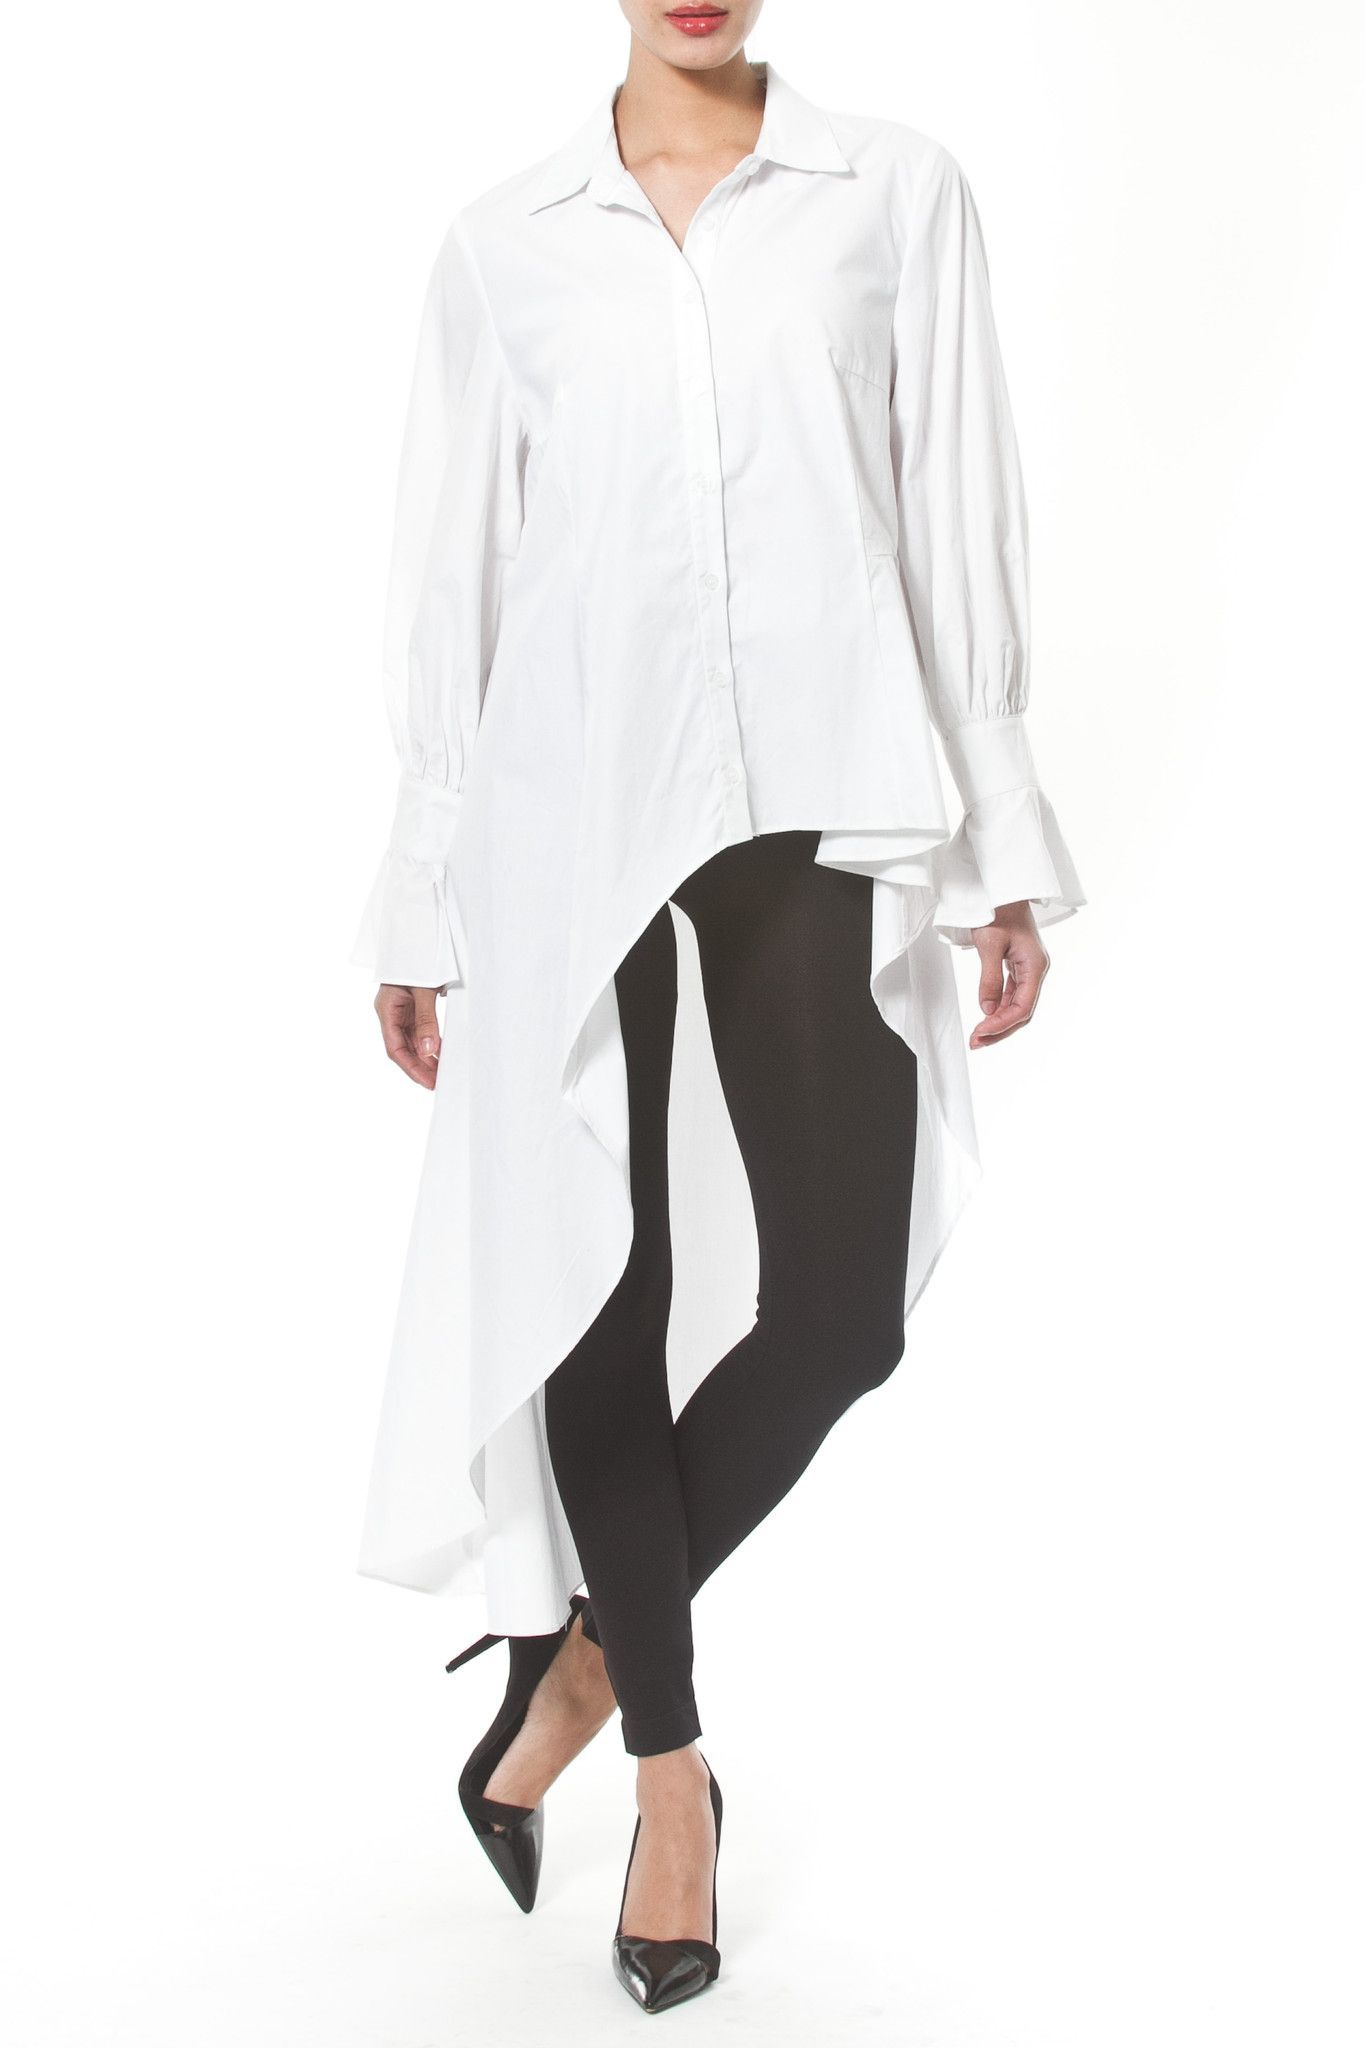 OVERSIZE WHITE SHIRT/DRESS